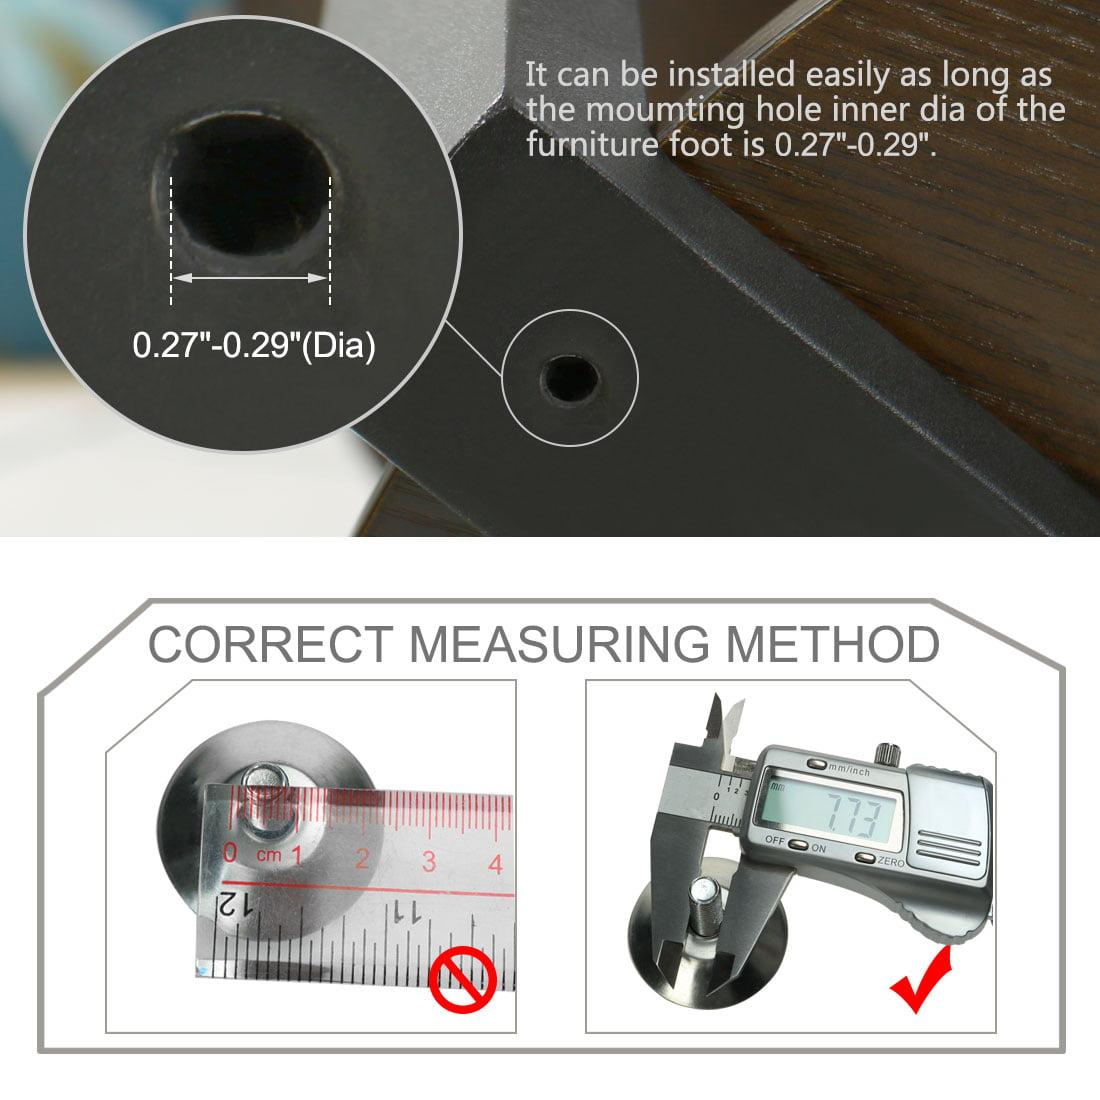 M8 x 25 x 27mm Leveling Feet Adjustable Leveler for Table Machine Leg 20pcs - image 2 de 7